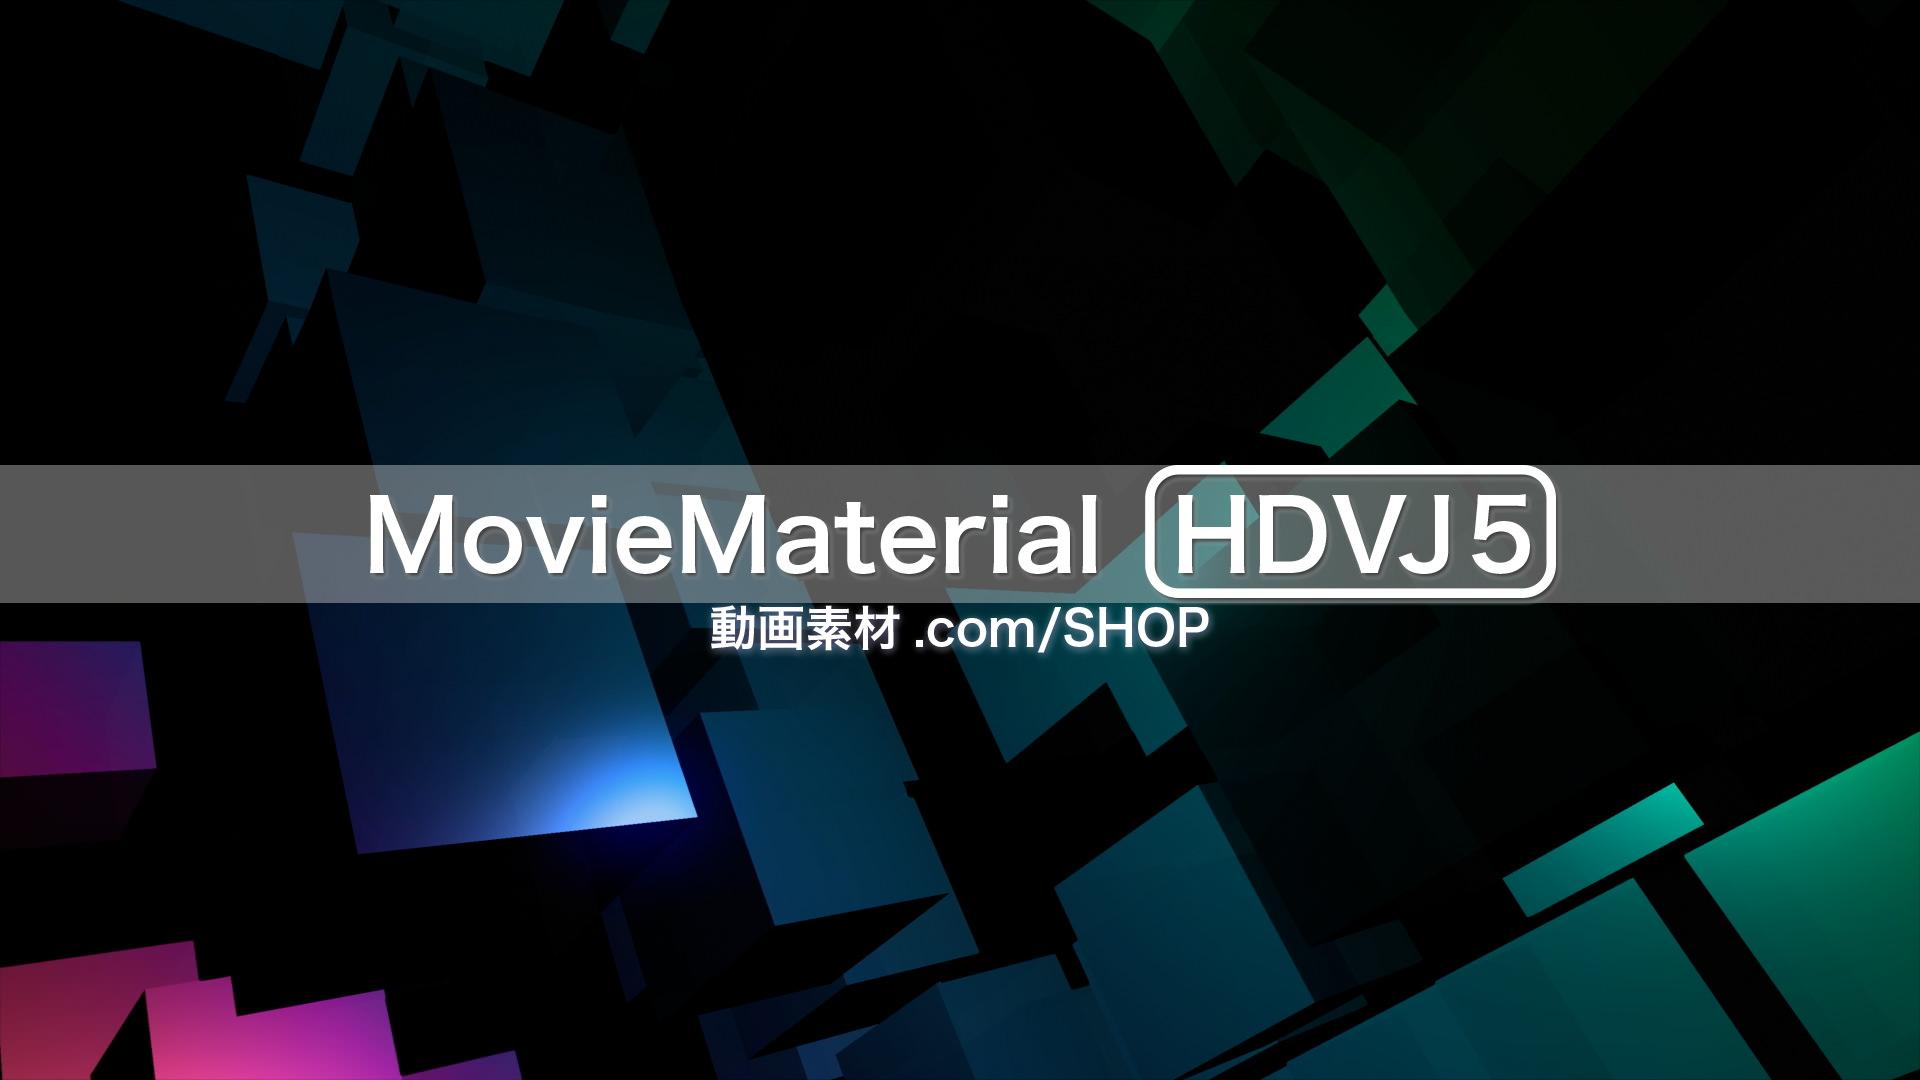 MovieMaterial HDVJ5 フルハイビジョンVJ動画素材集 画像7